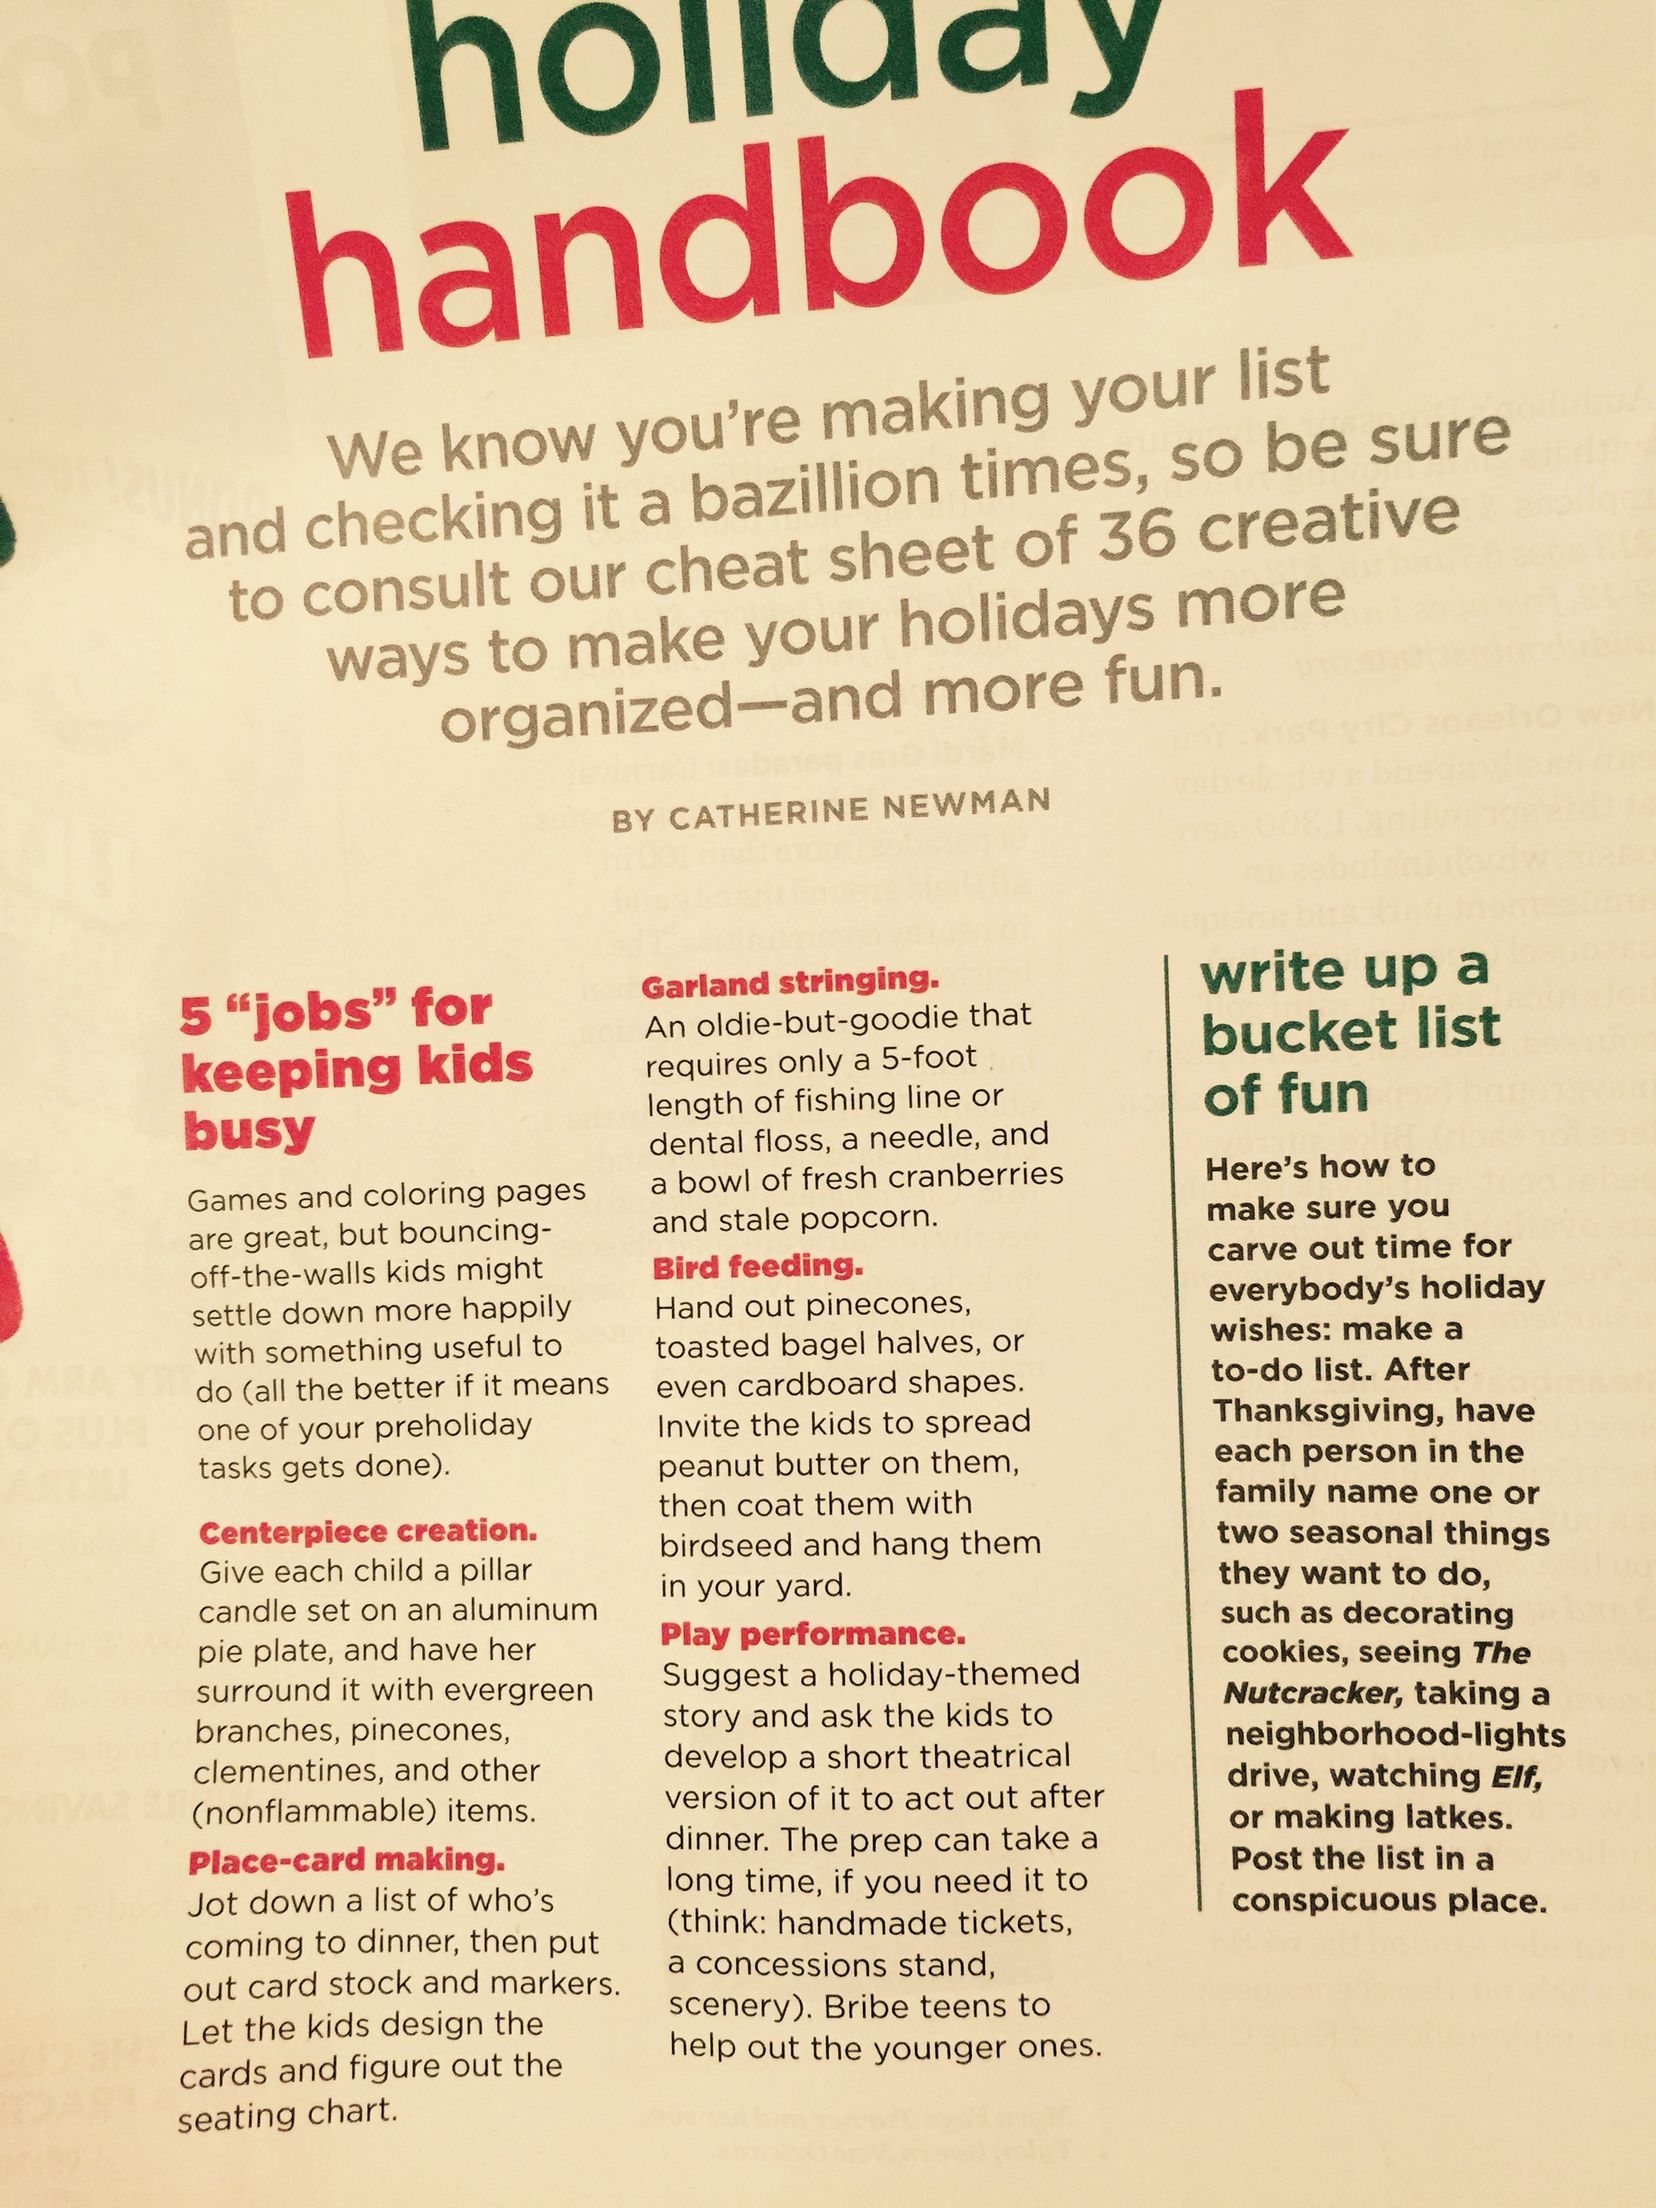 Holiday handbook Christmas Pinterest